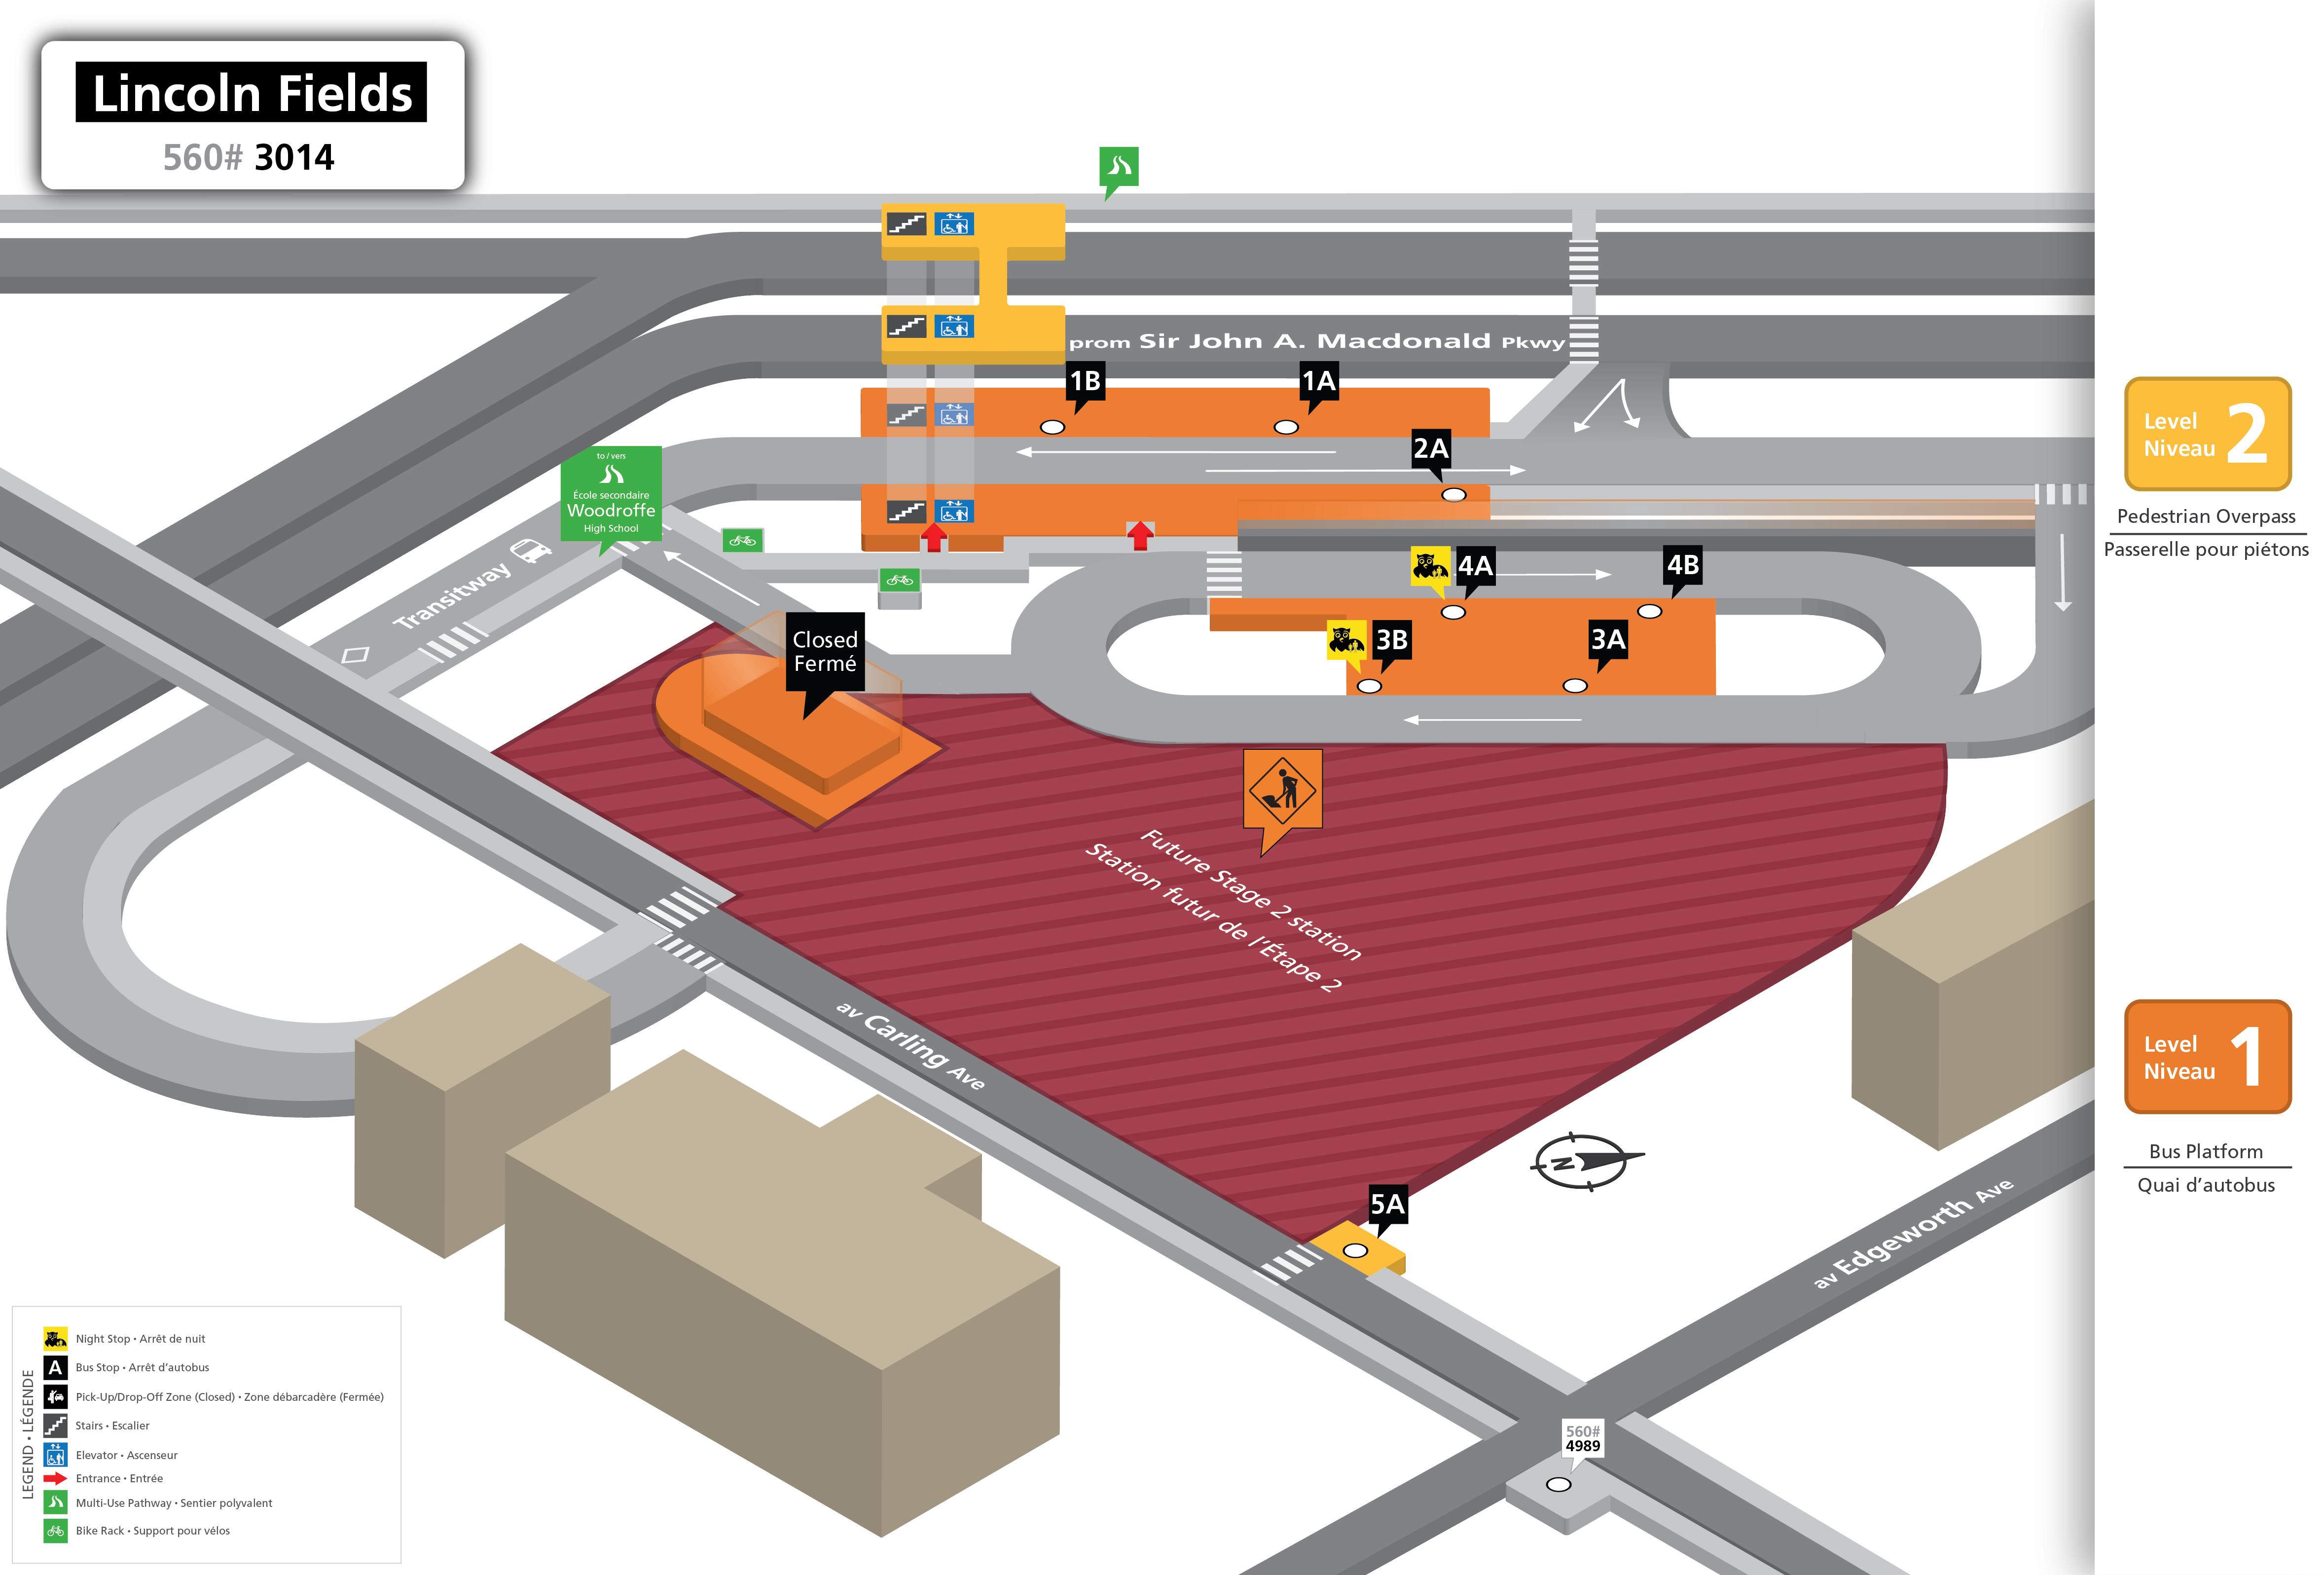 Station Layout